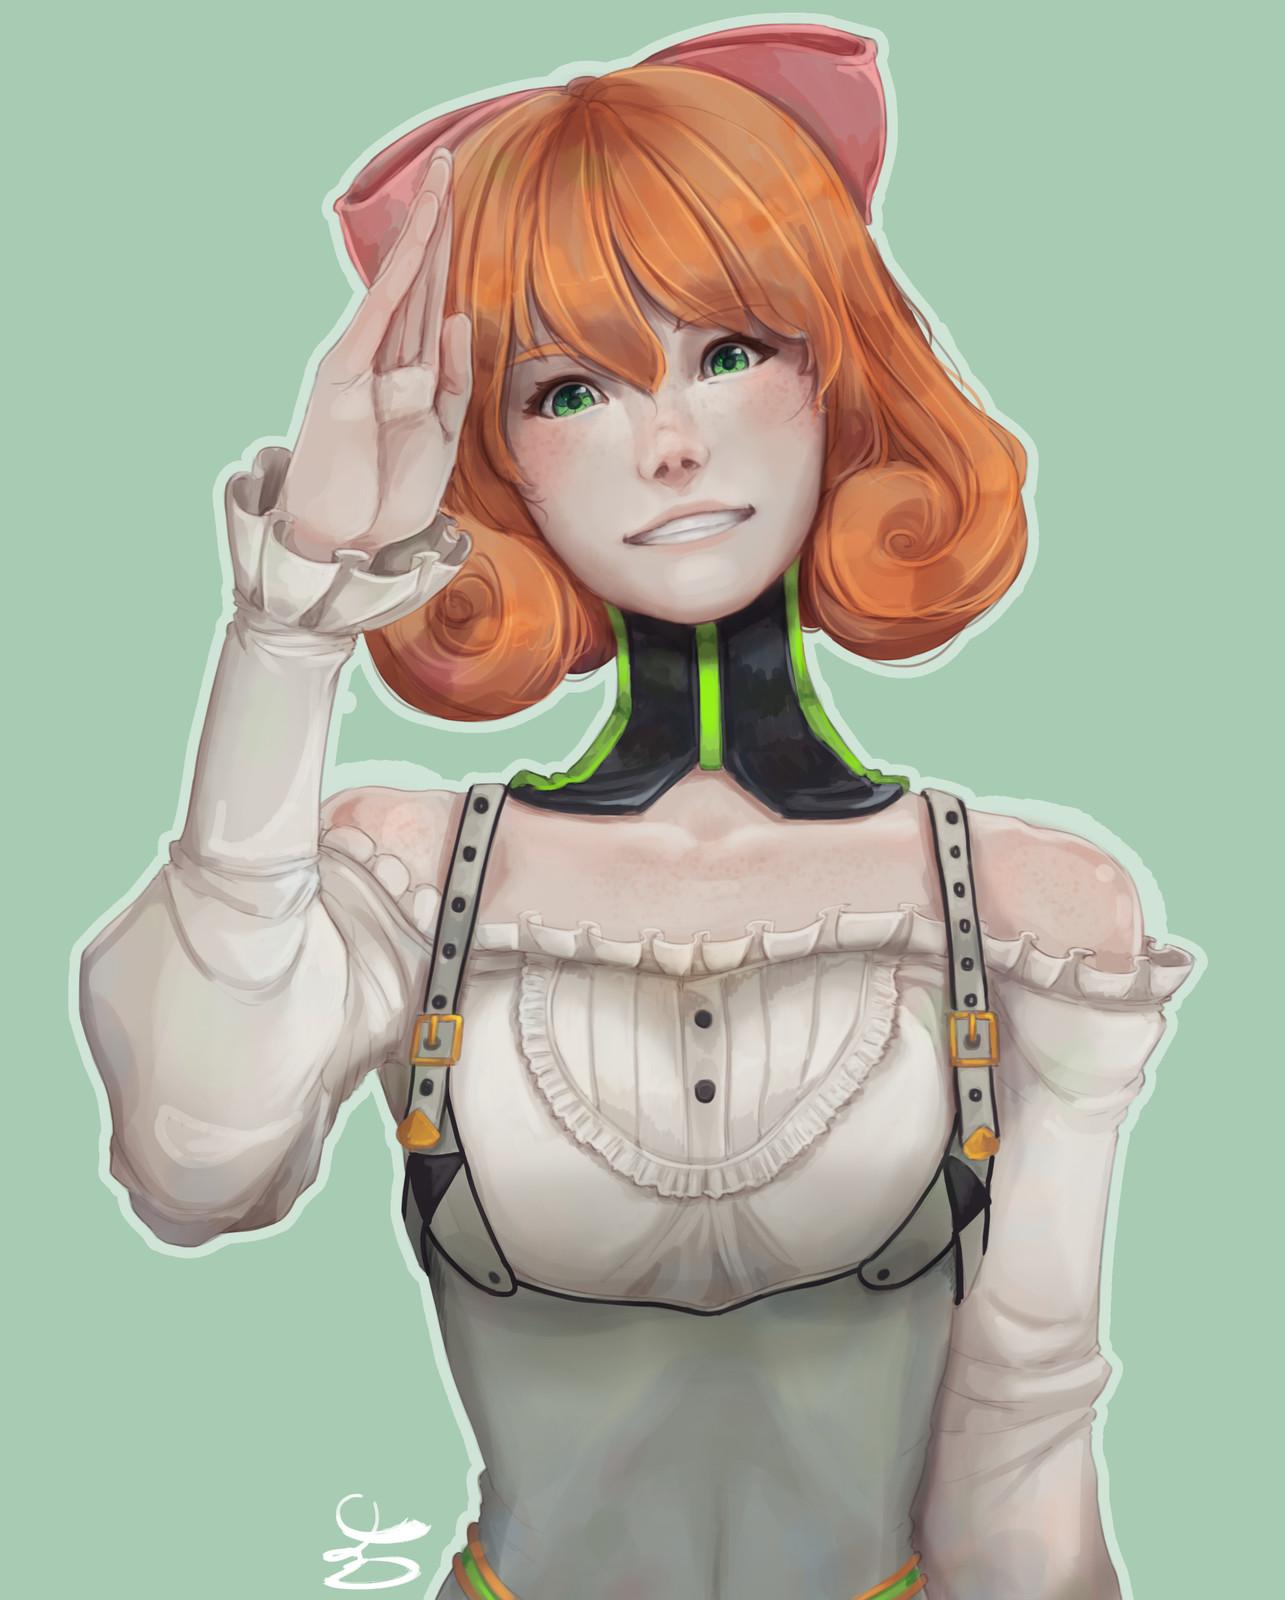 Artstation Penny Polendina Maki S Atelier Like many people penny is my fave character. artstation penny polendina maki s